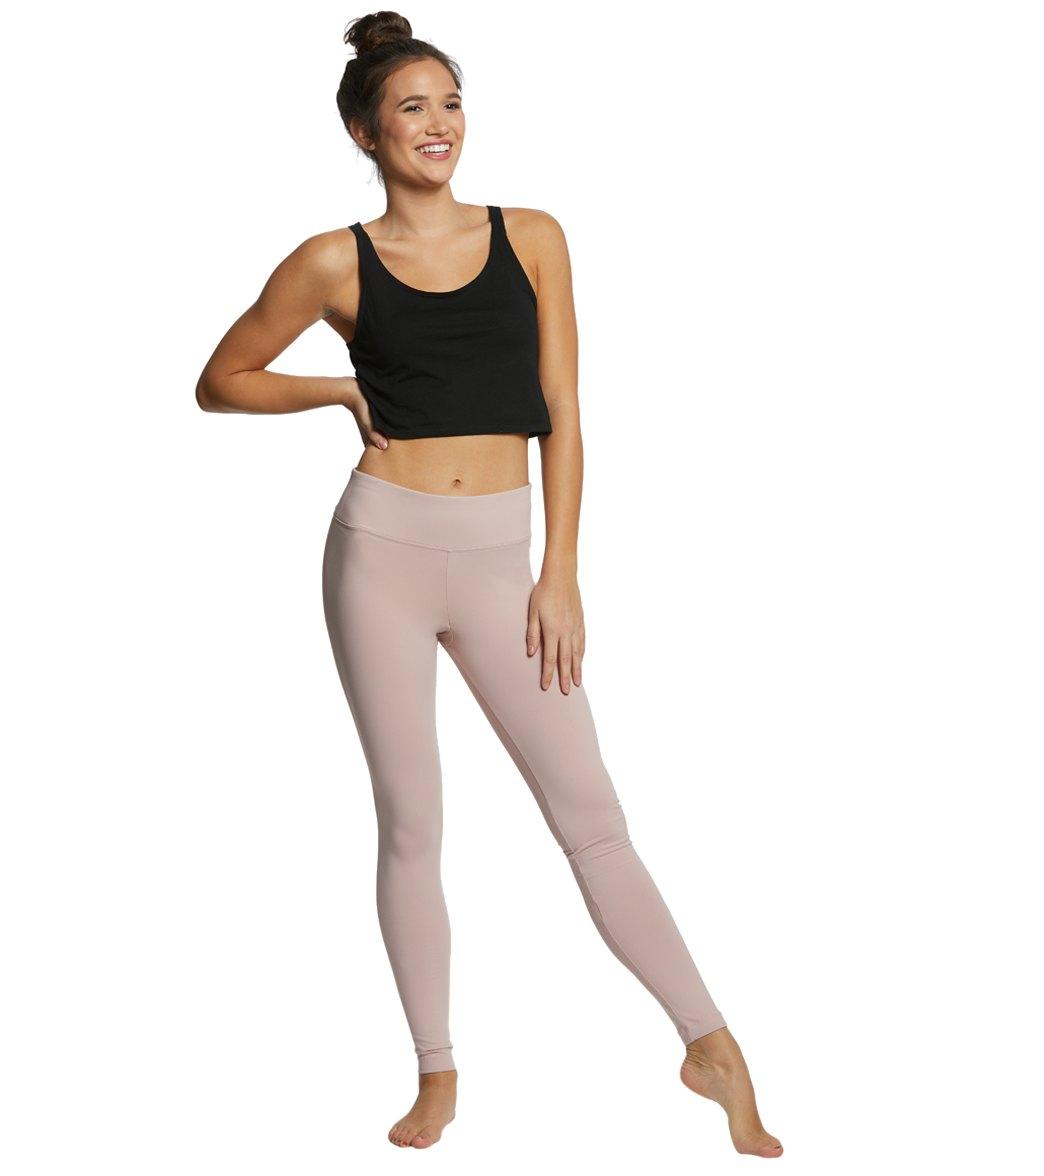 0bdee5116c5a6 Danskin Body Fit Ankle Yoga Leggings at YogaOutlet.com